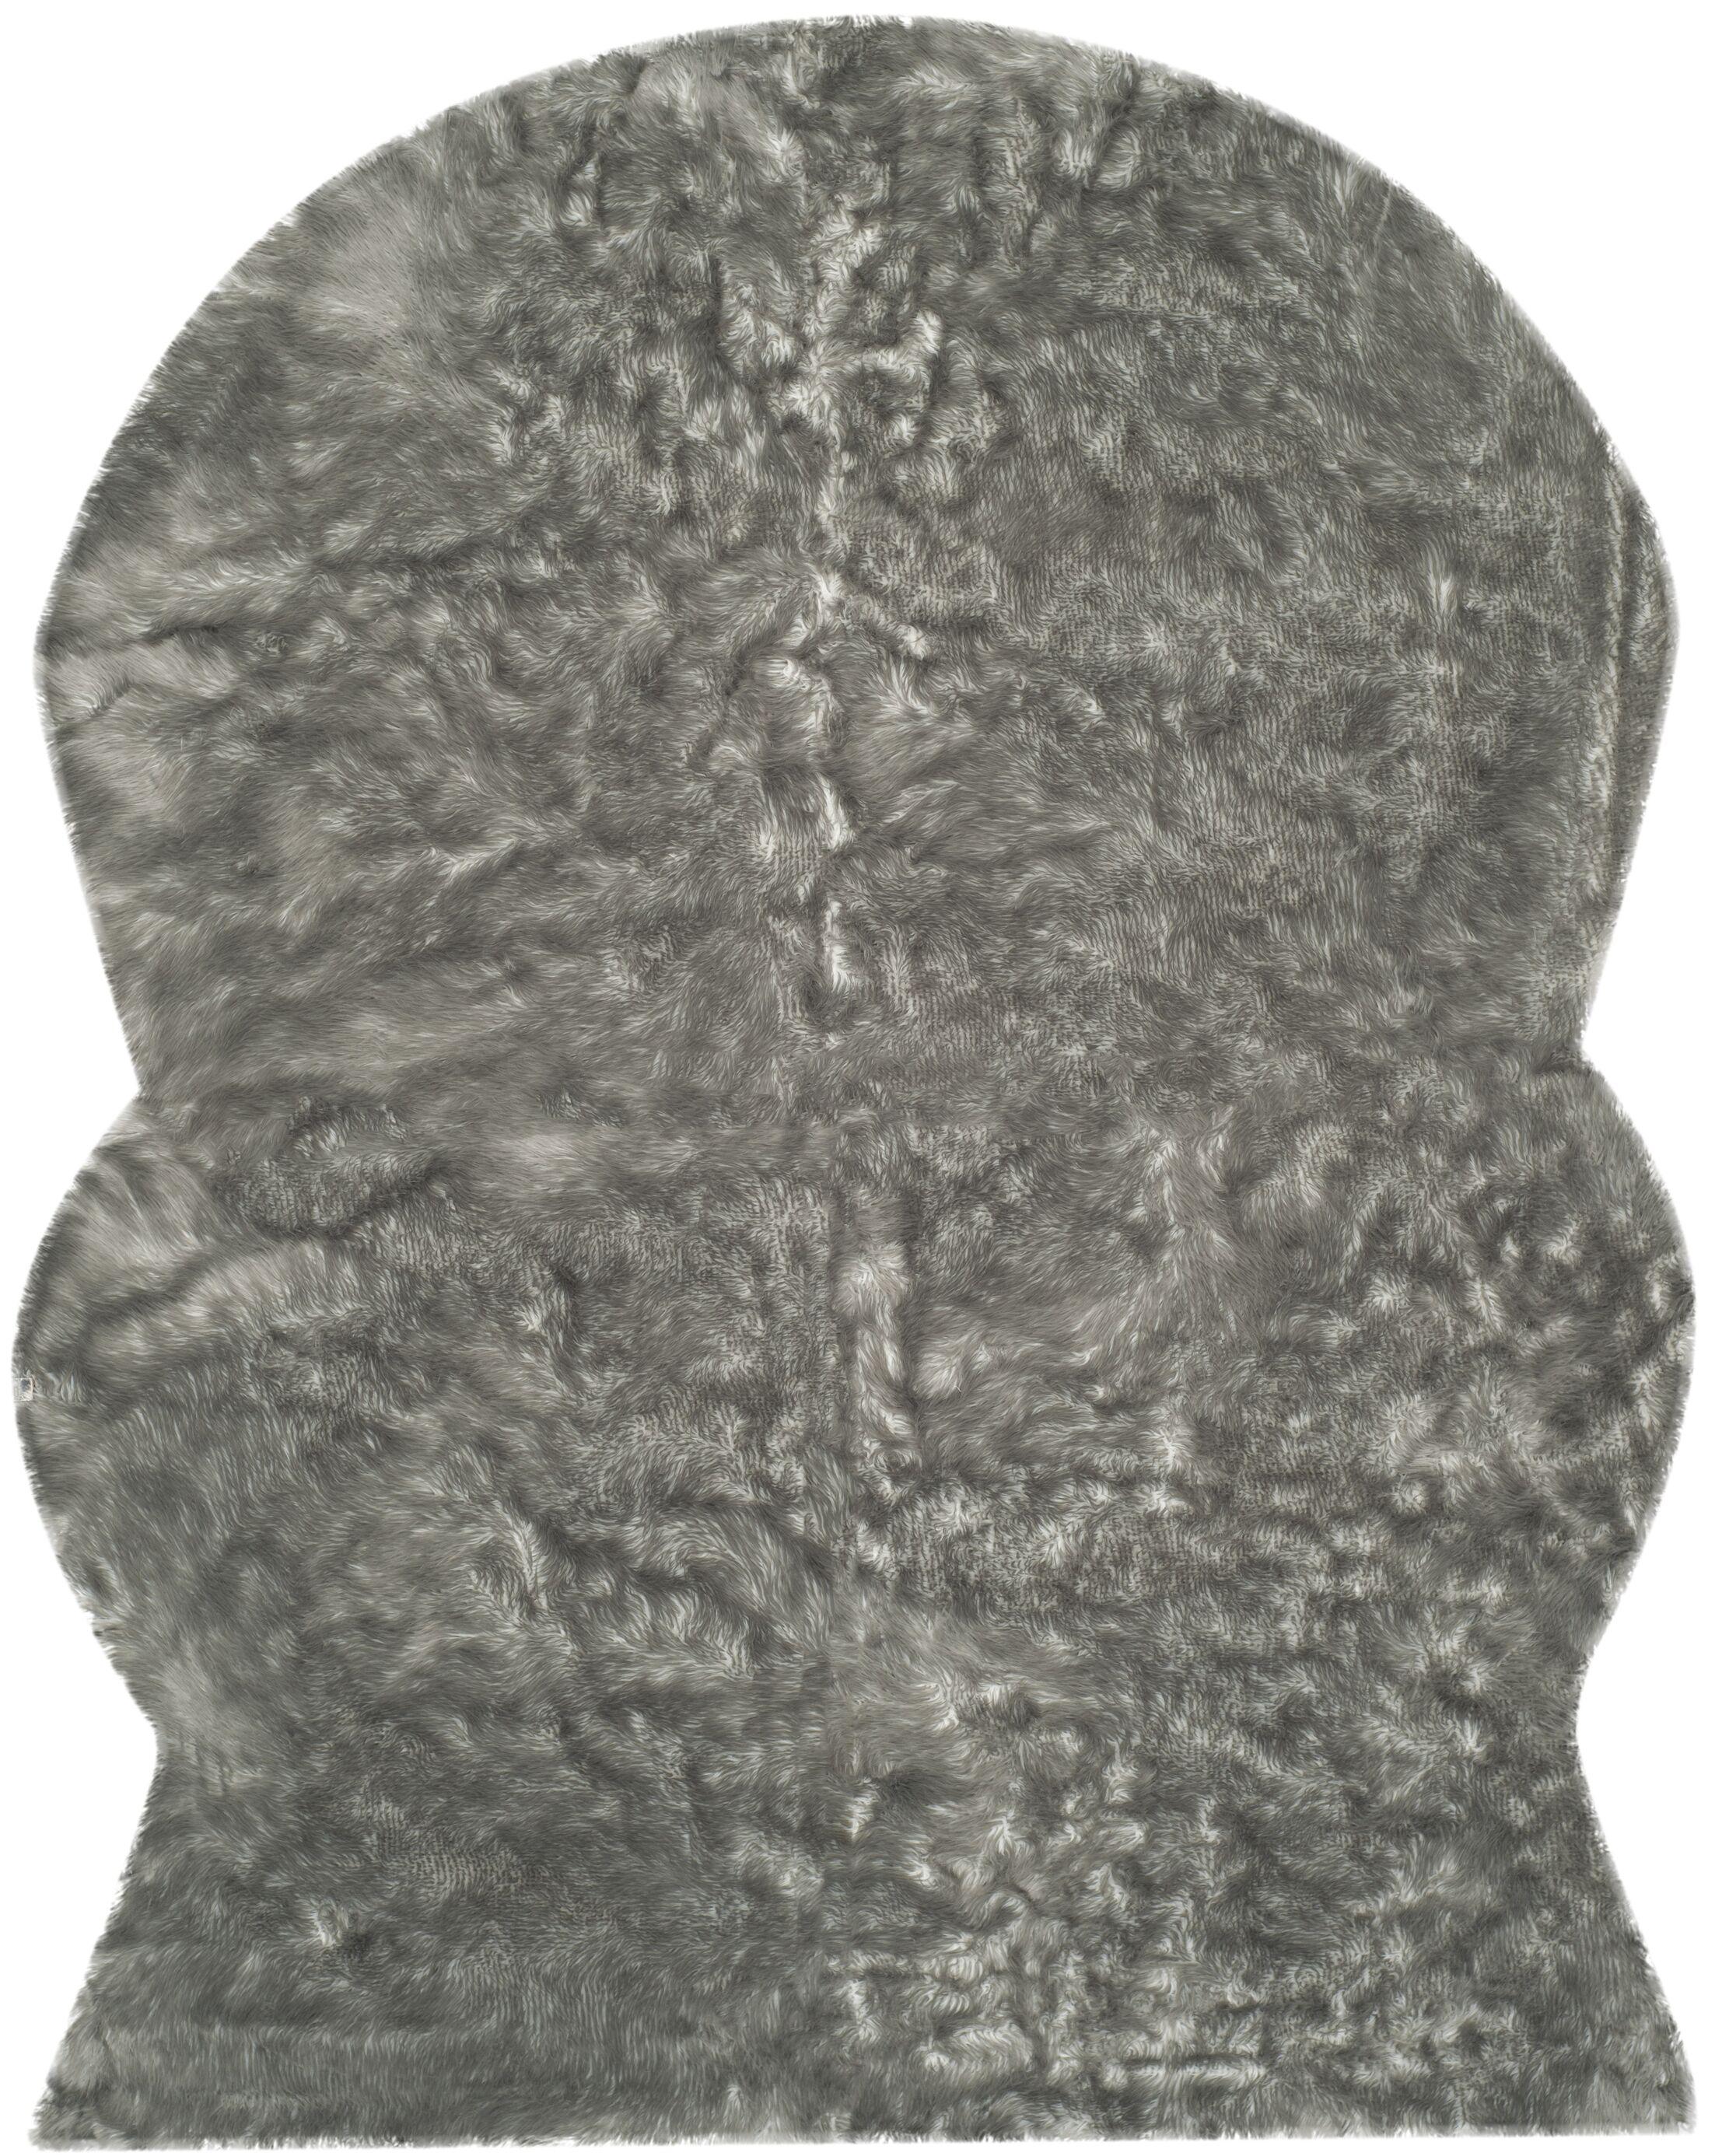 Brennan Dark Gray Area Rug Rug Size: Rectangle 8' x 10'